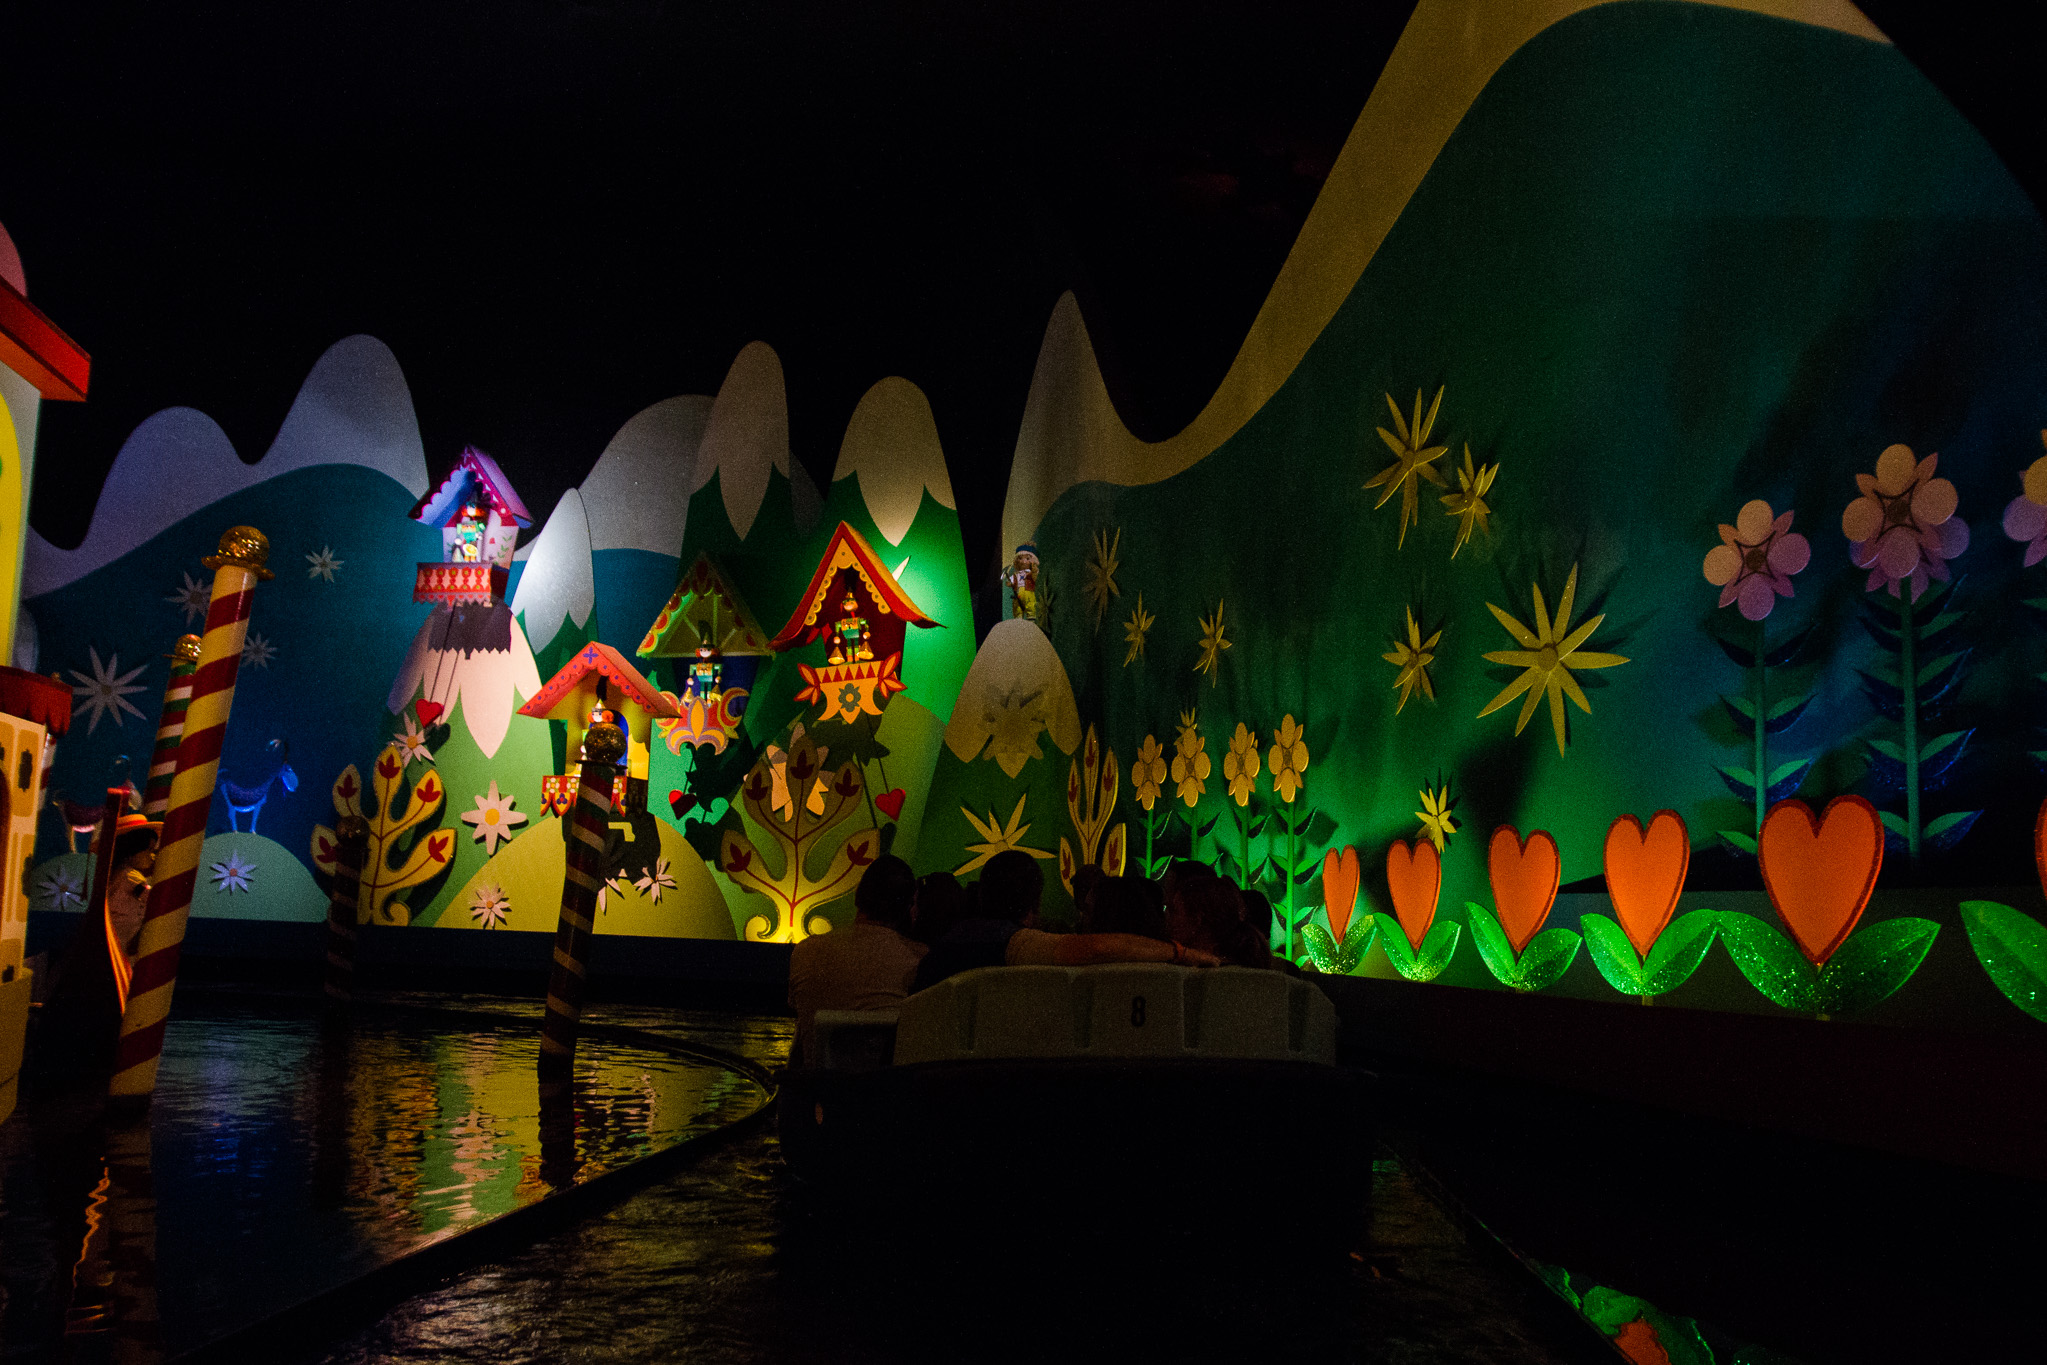 magic kingdom photographer / disney vacation photographer / it's a small world